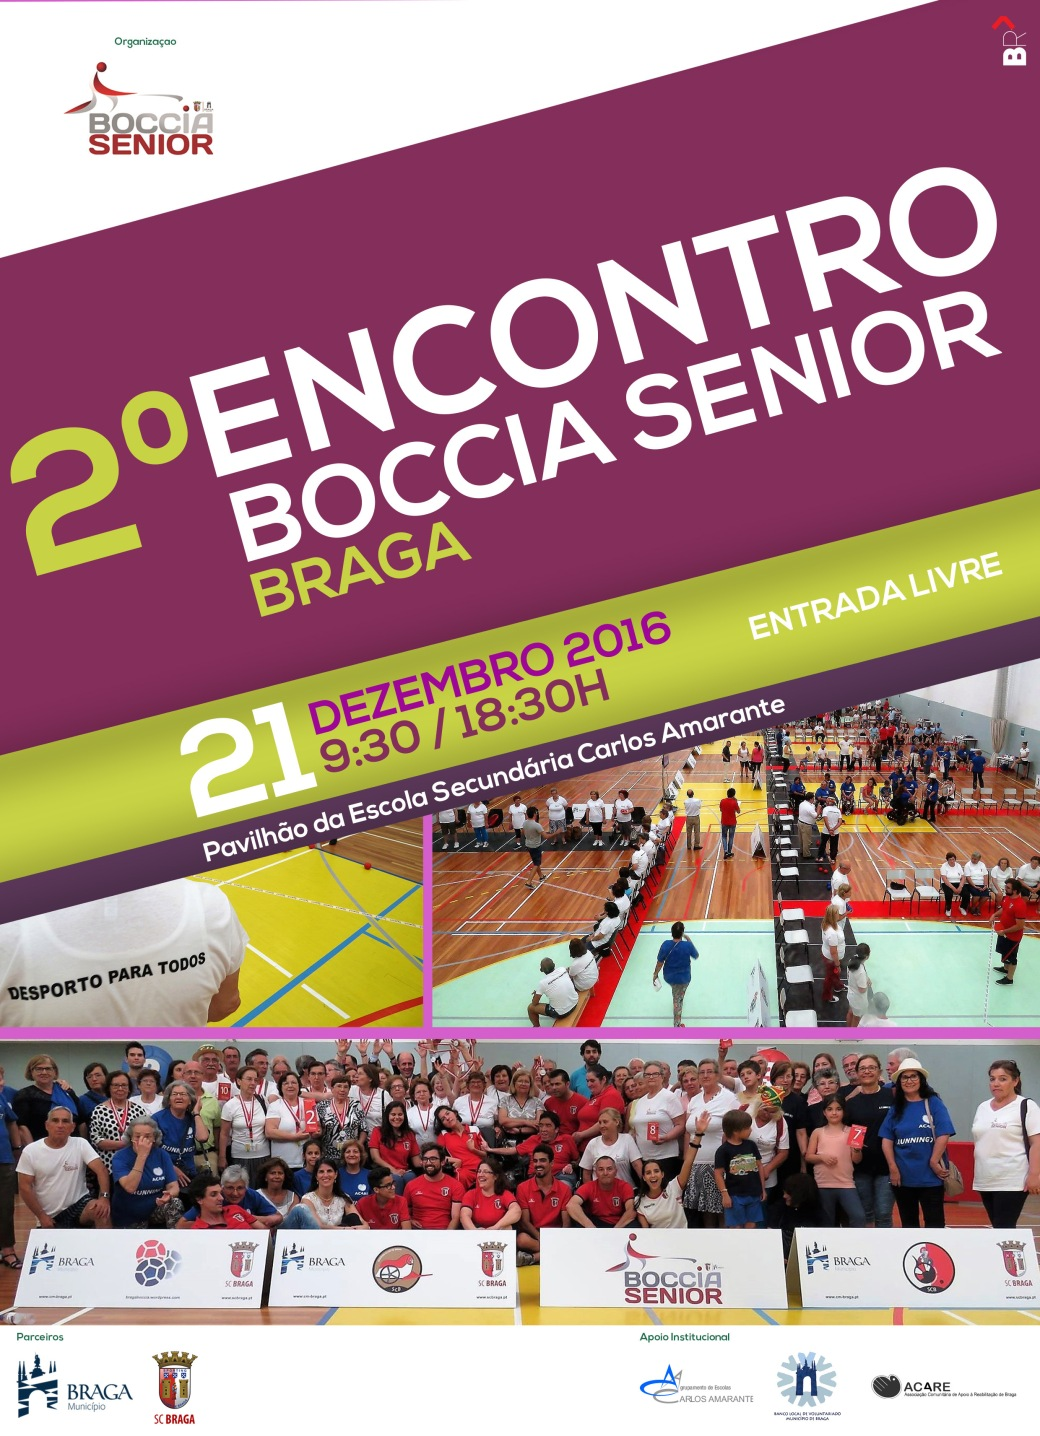 cartaz_2o-encontro-boccia-senior-braga